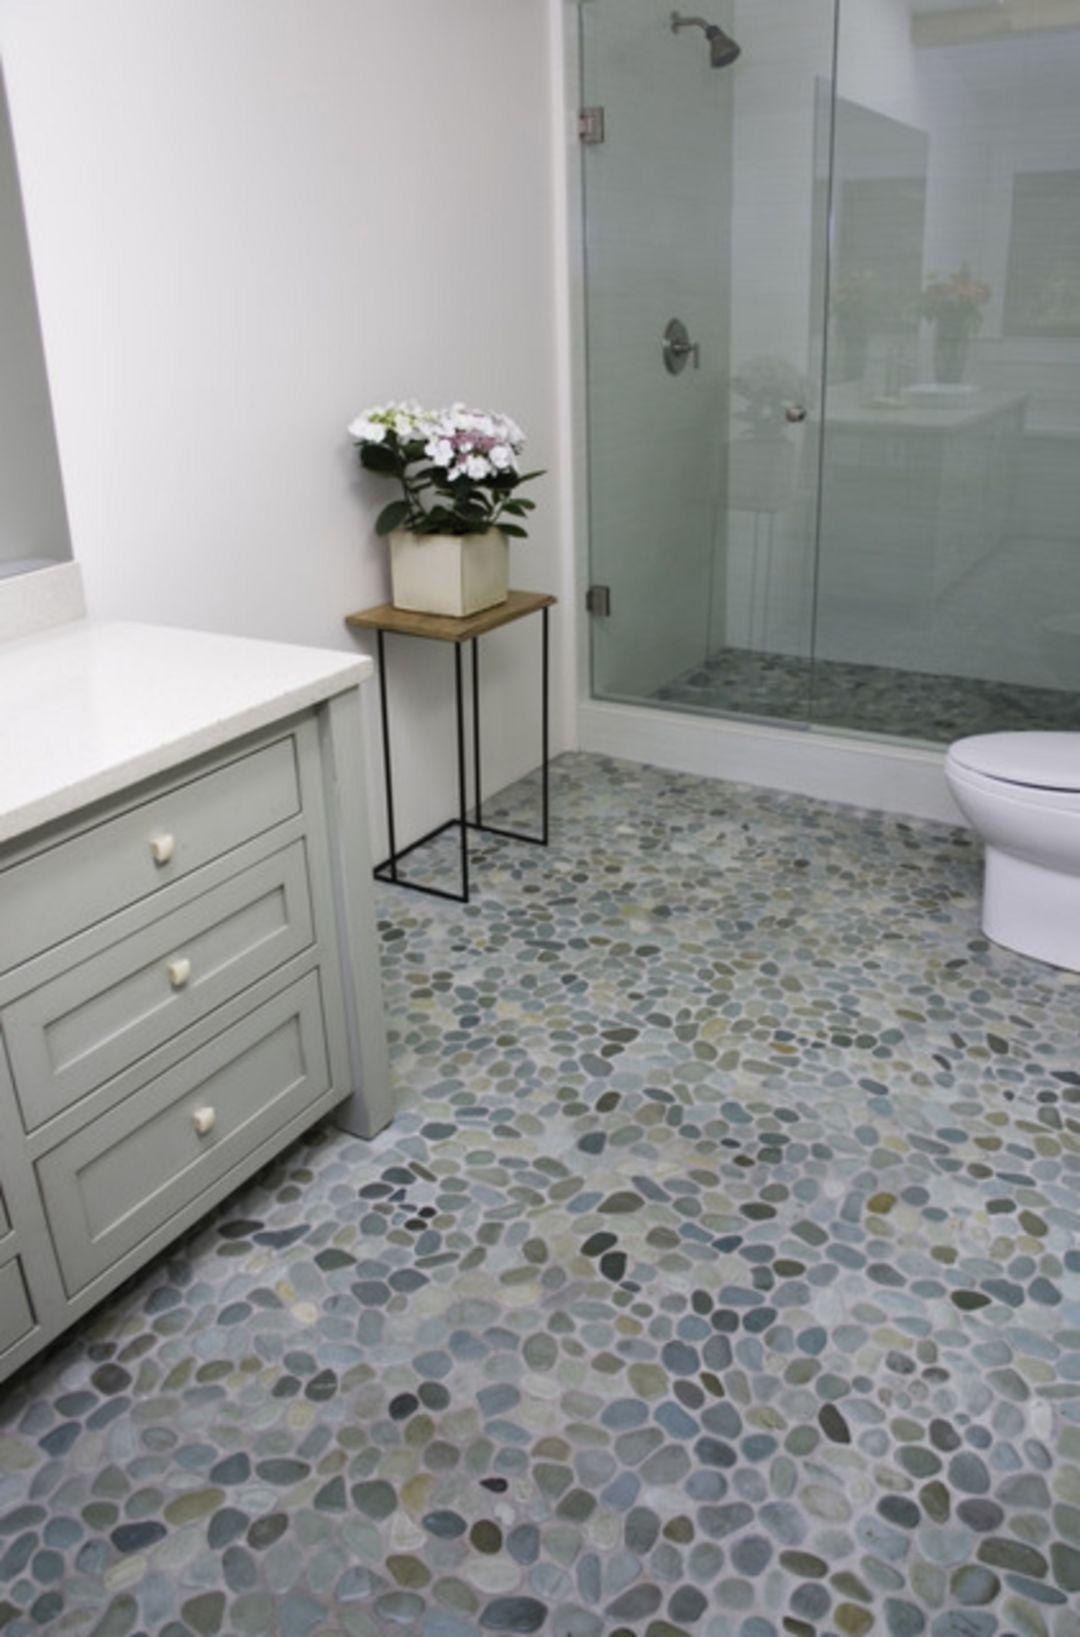 15 Floor Tile Designs For The Foyer: 15 Amazing Floor Design Ideas For Your Bathroom